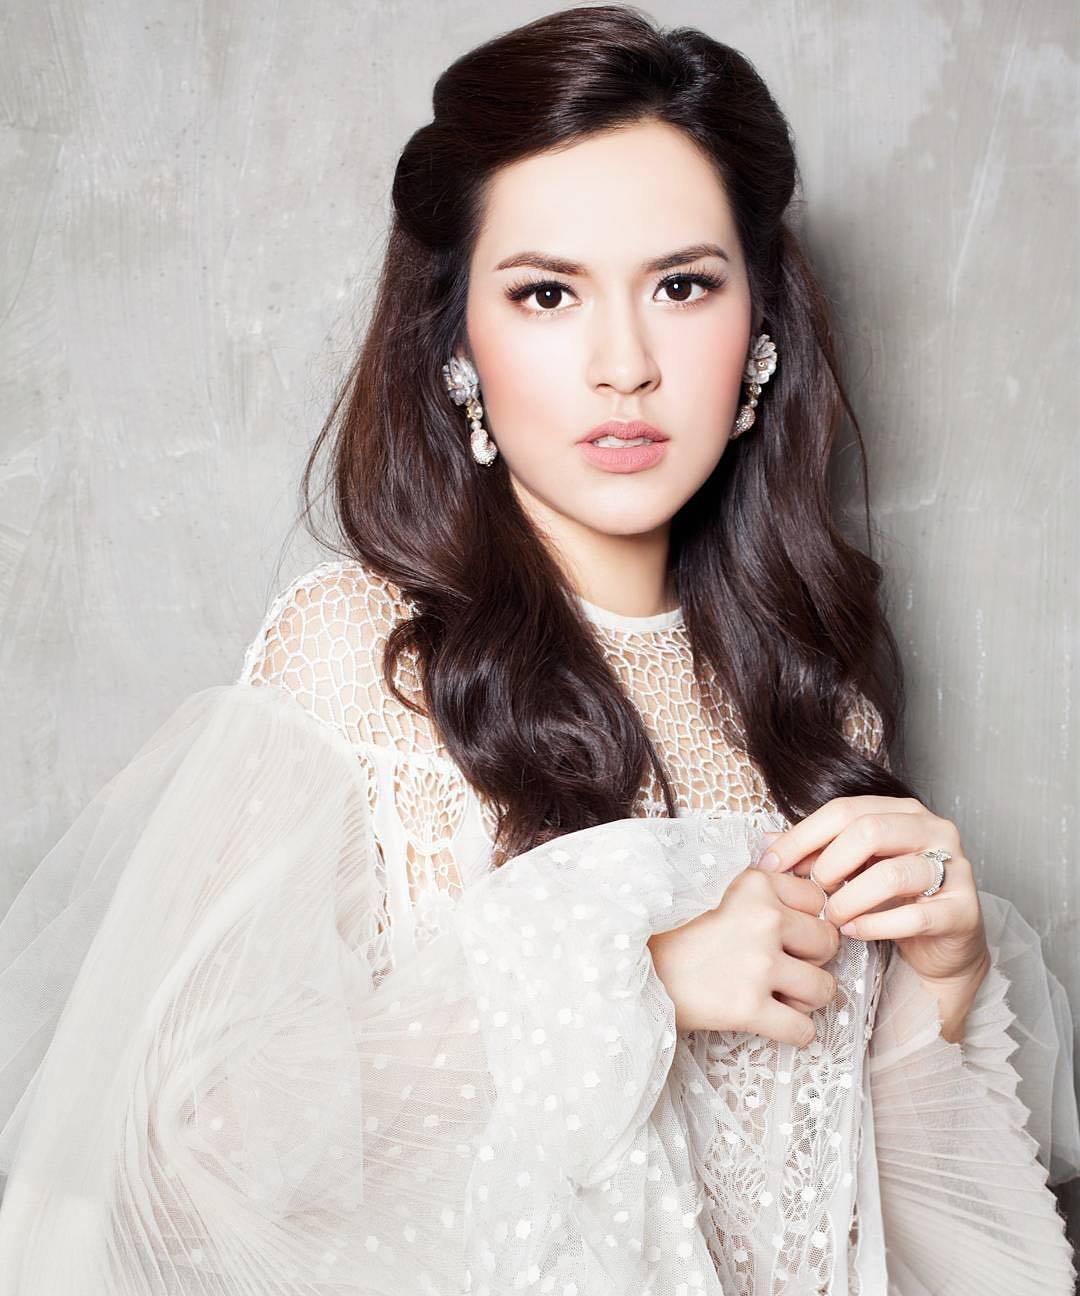 5 Artis Indonesia Paling Cantik